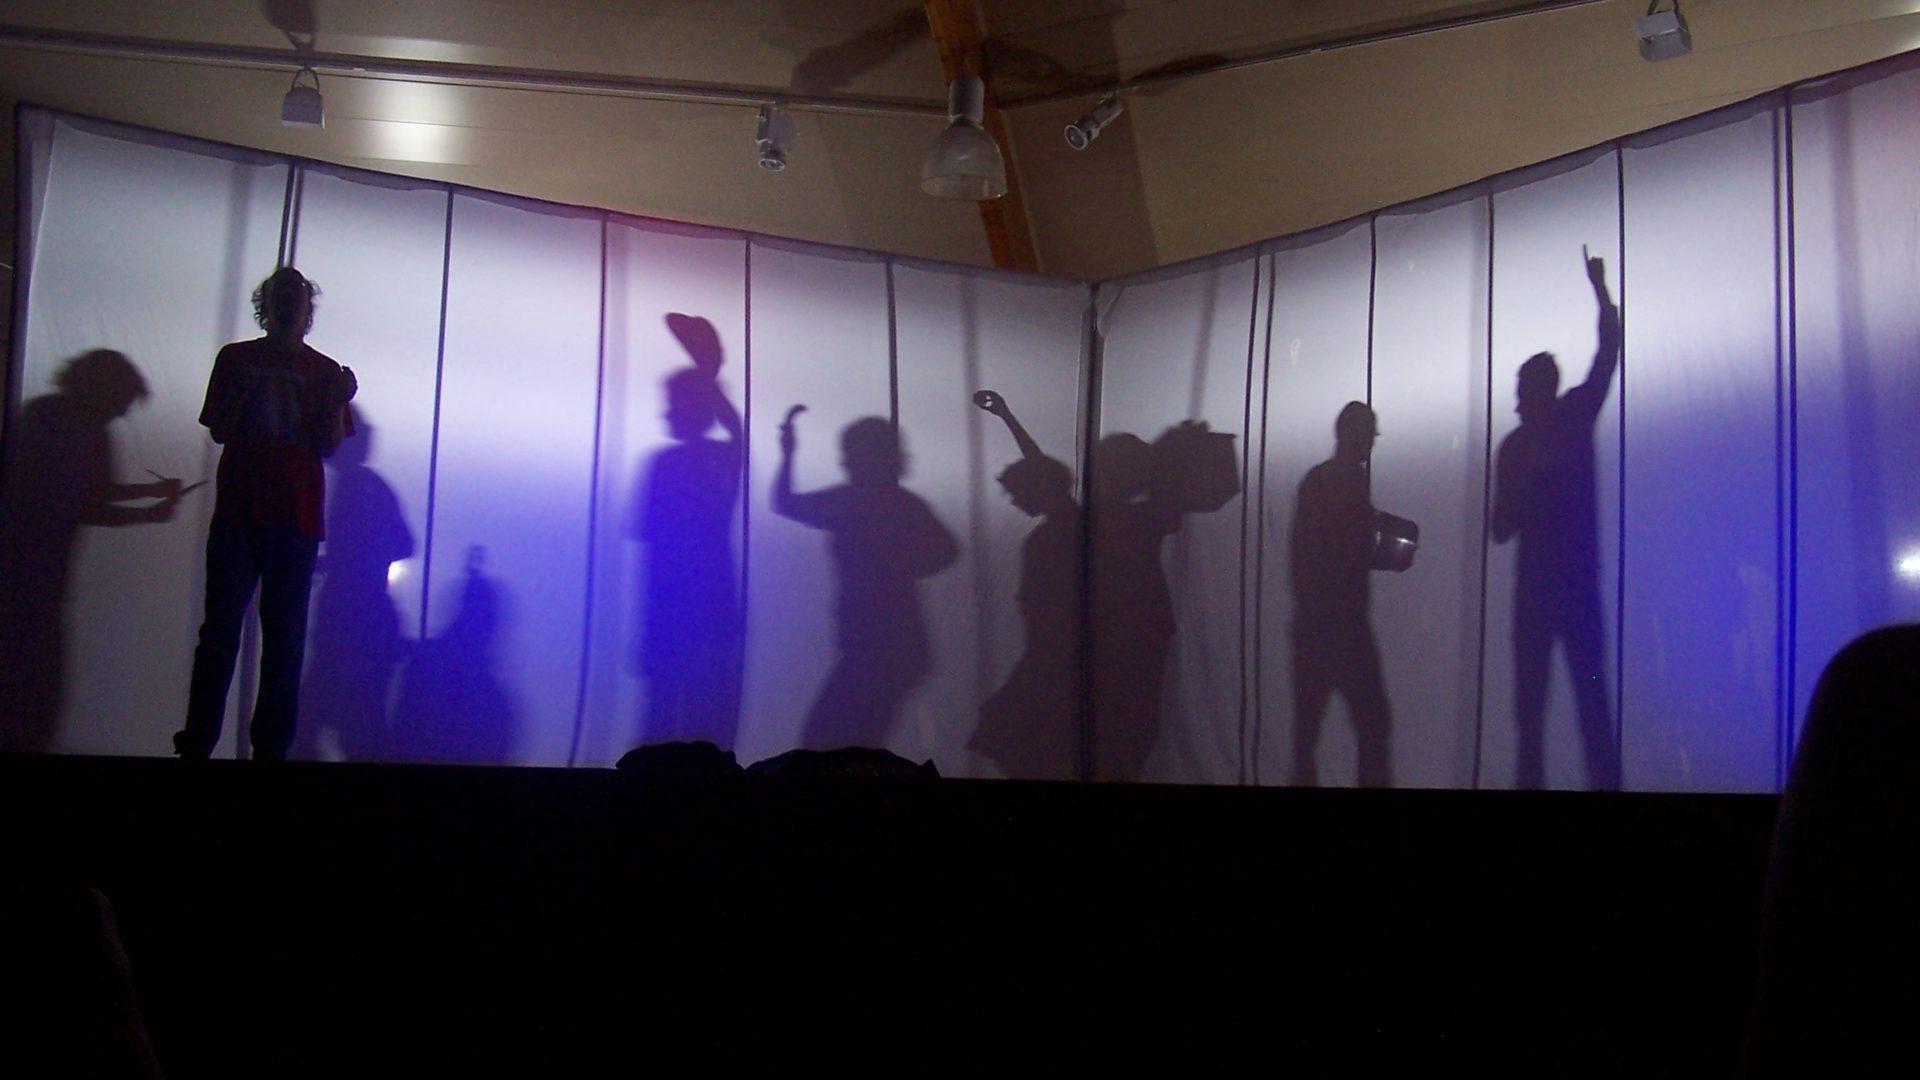 LesNoeils-Spectacle-Prises 2 tetes